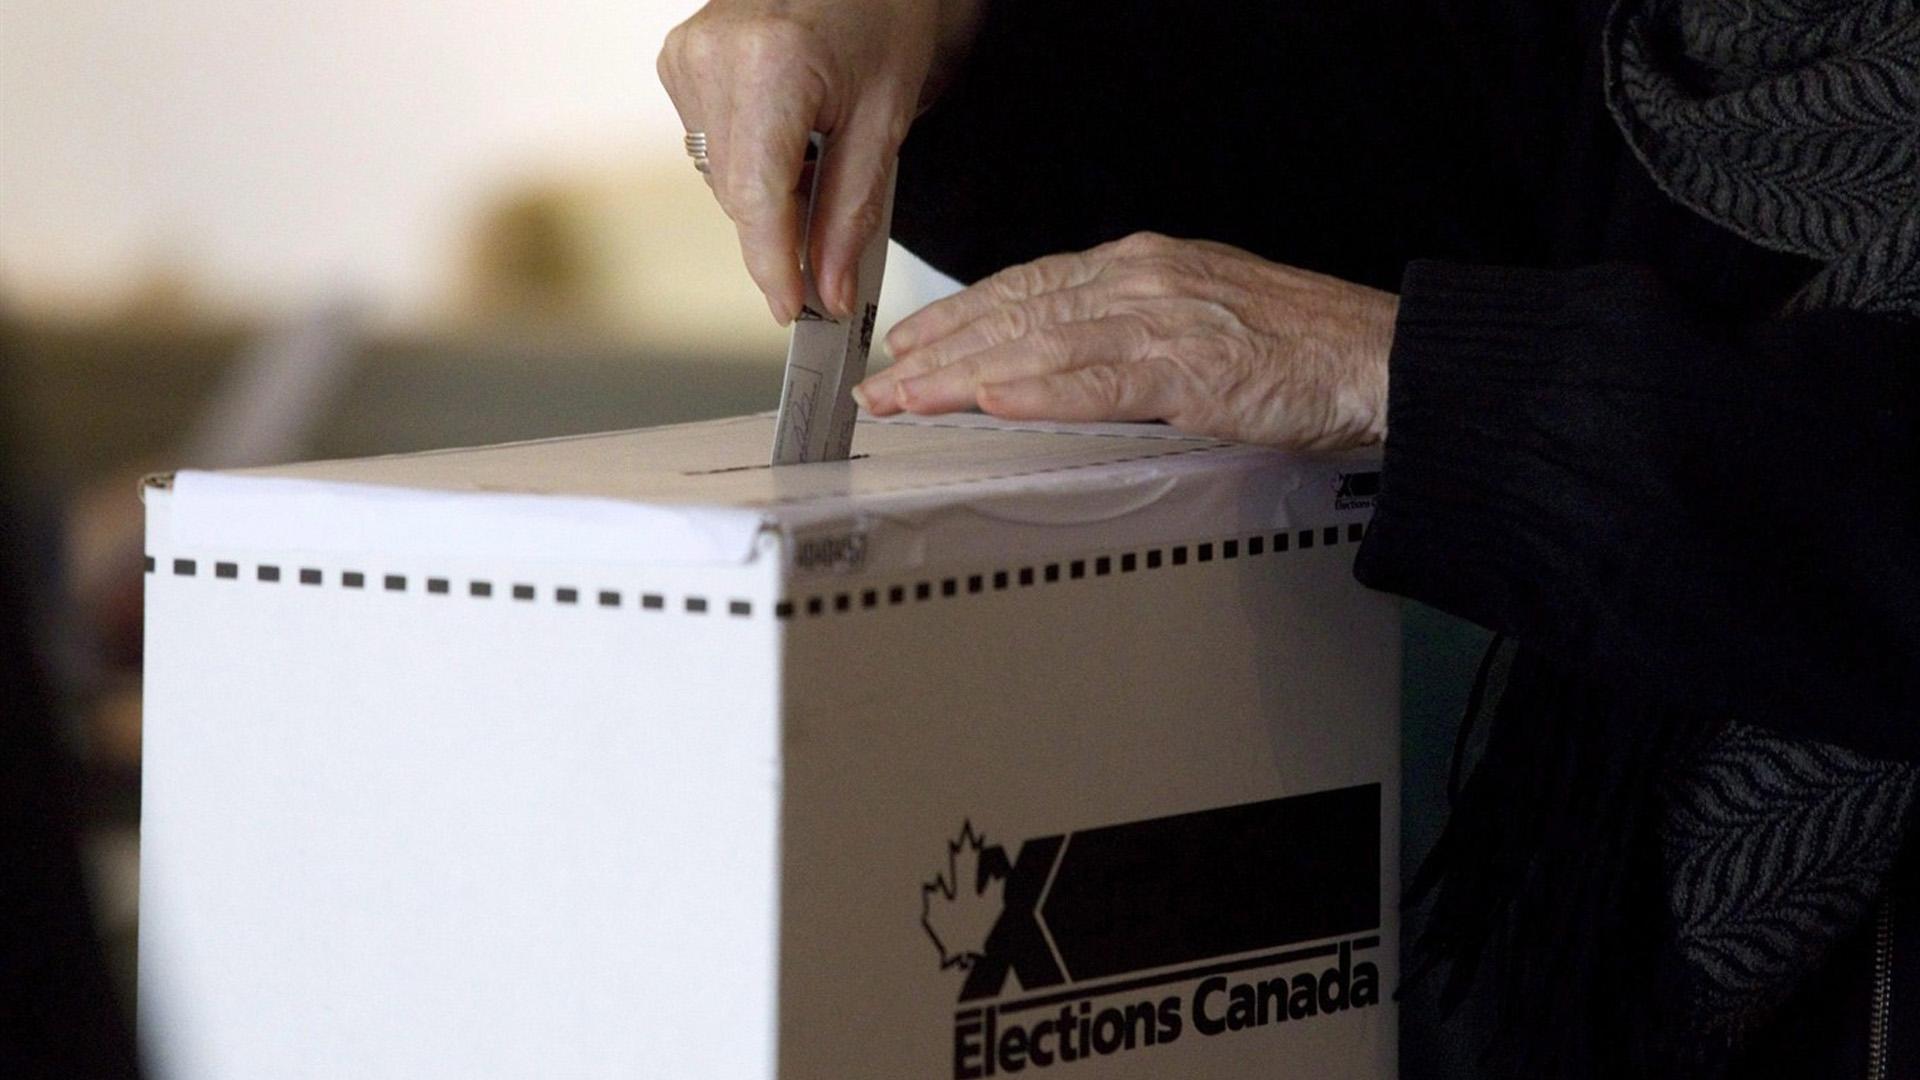 Exploring Toronto voter statistics using Golang